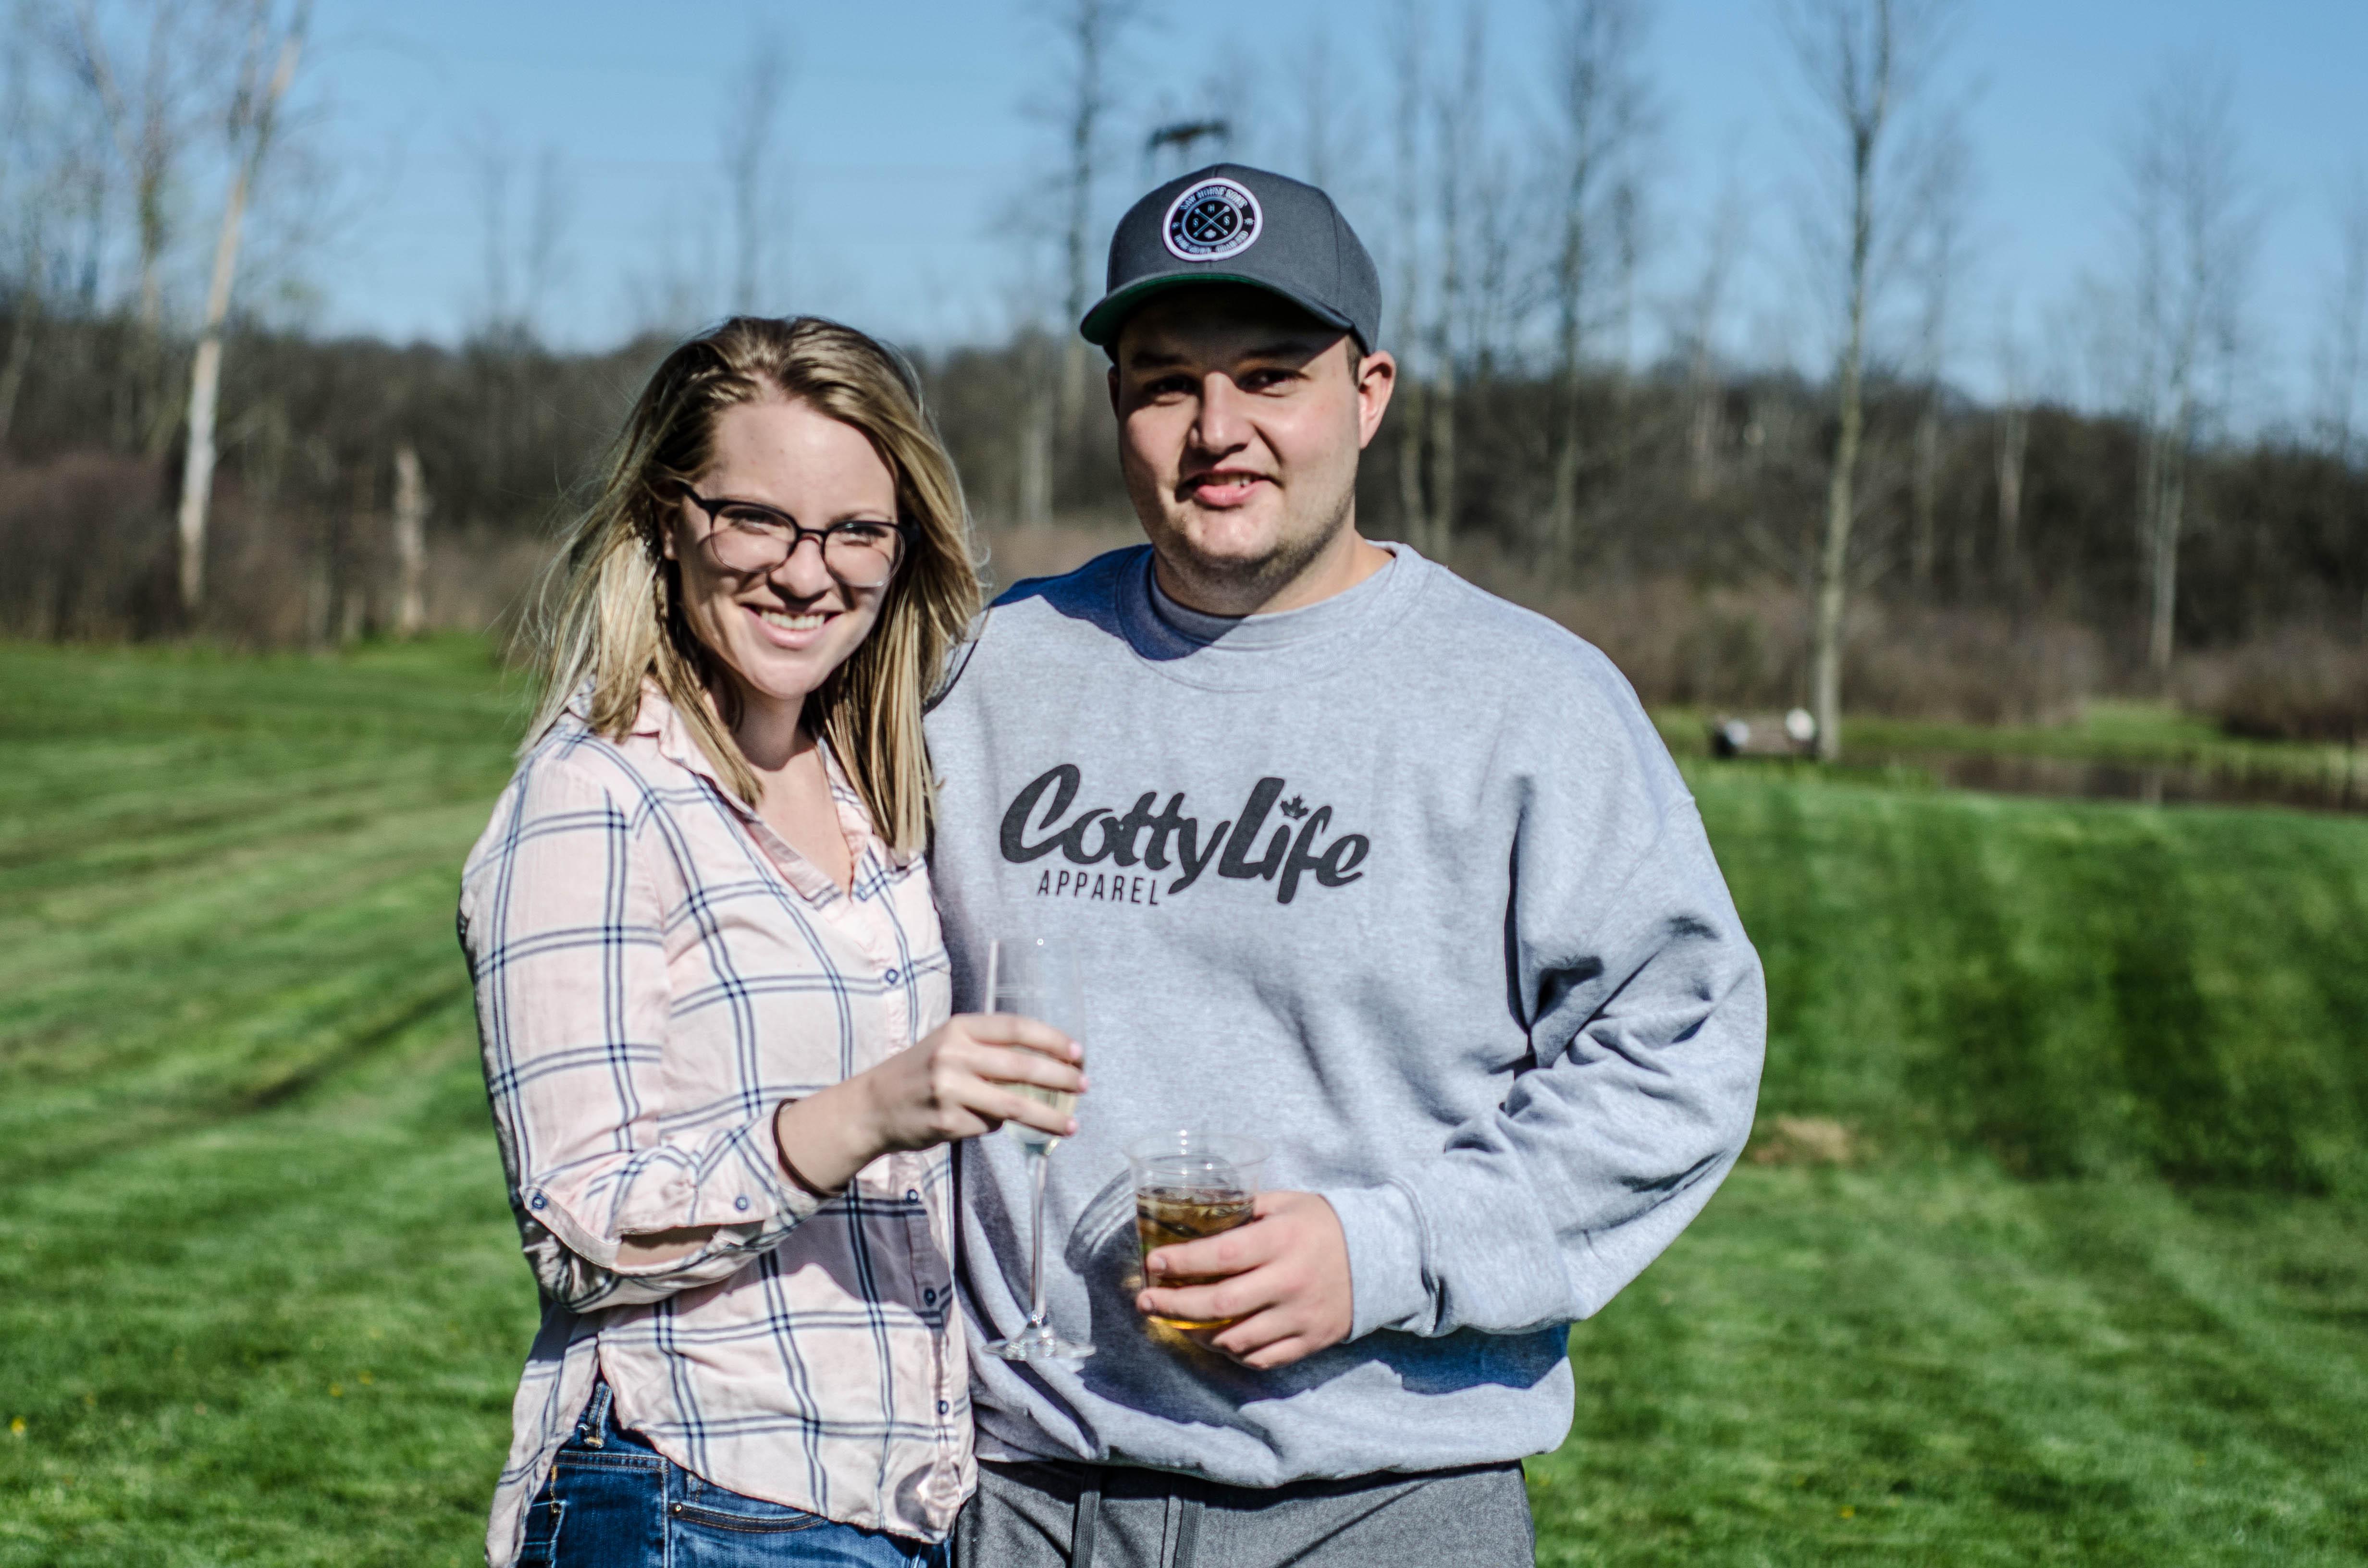 Image 4 of Josh and Megan